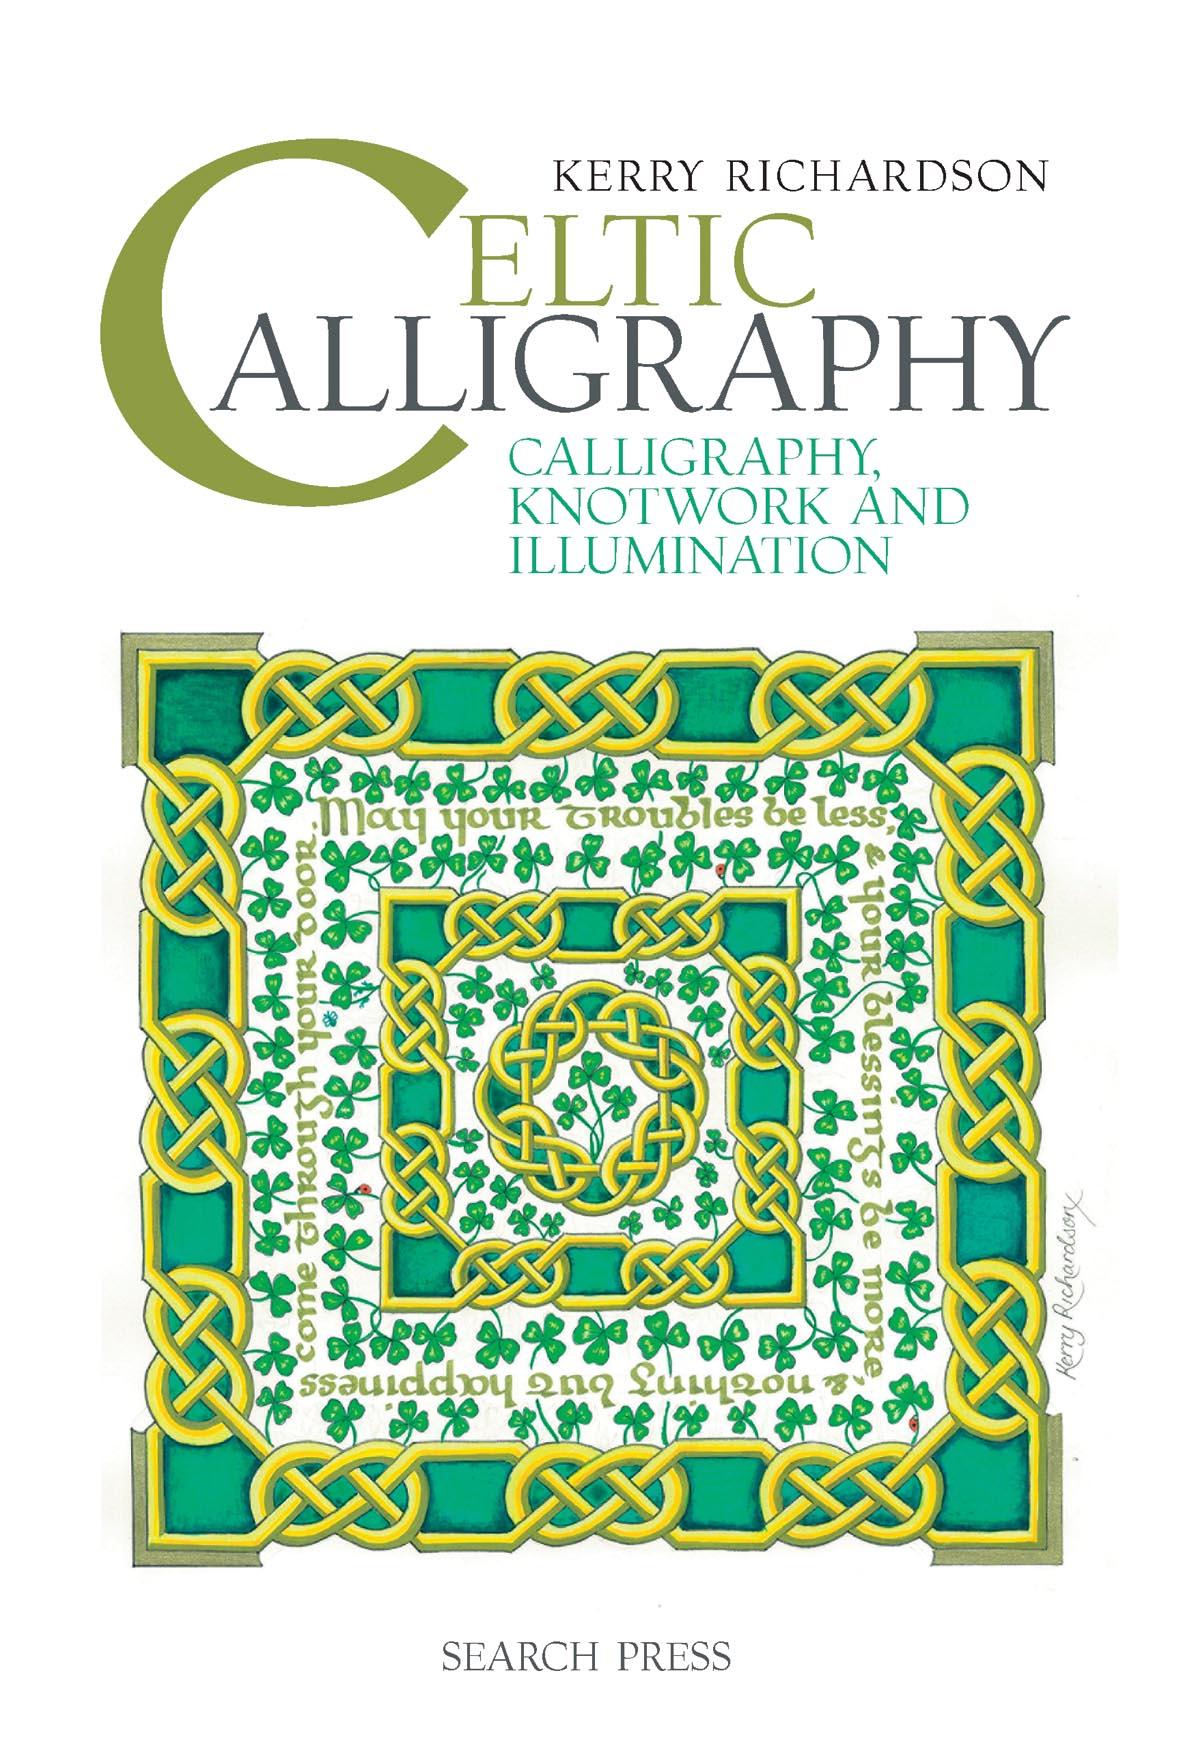 Kalligrafiaopas